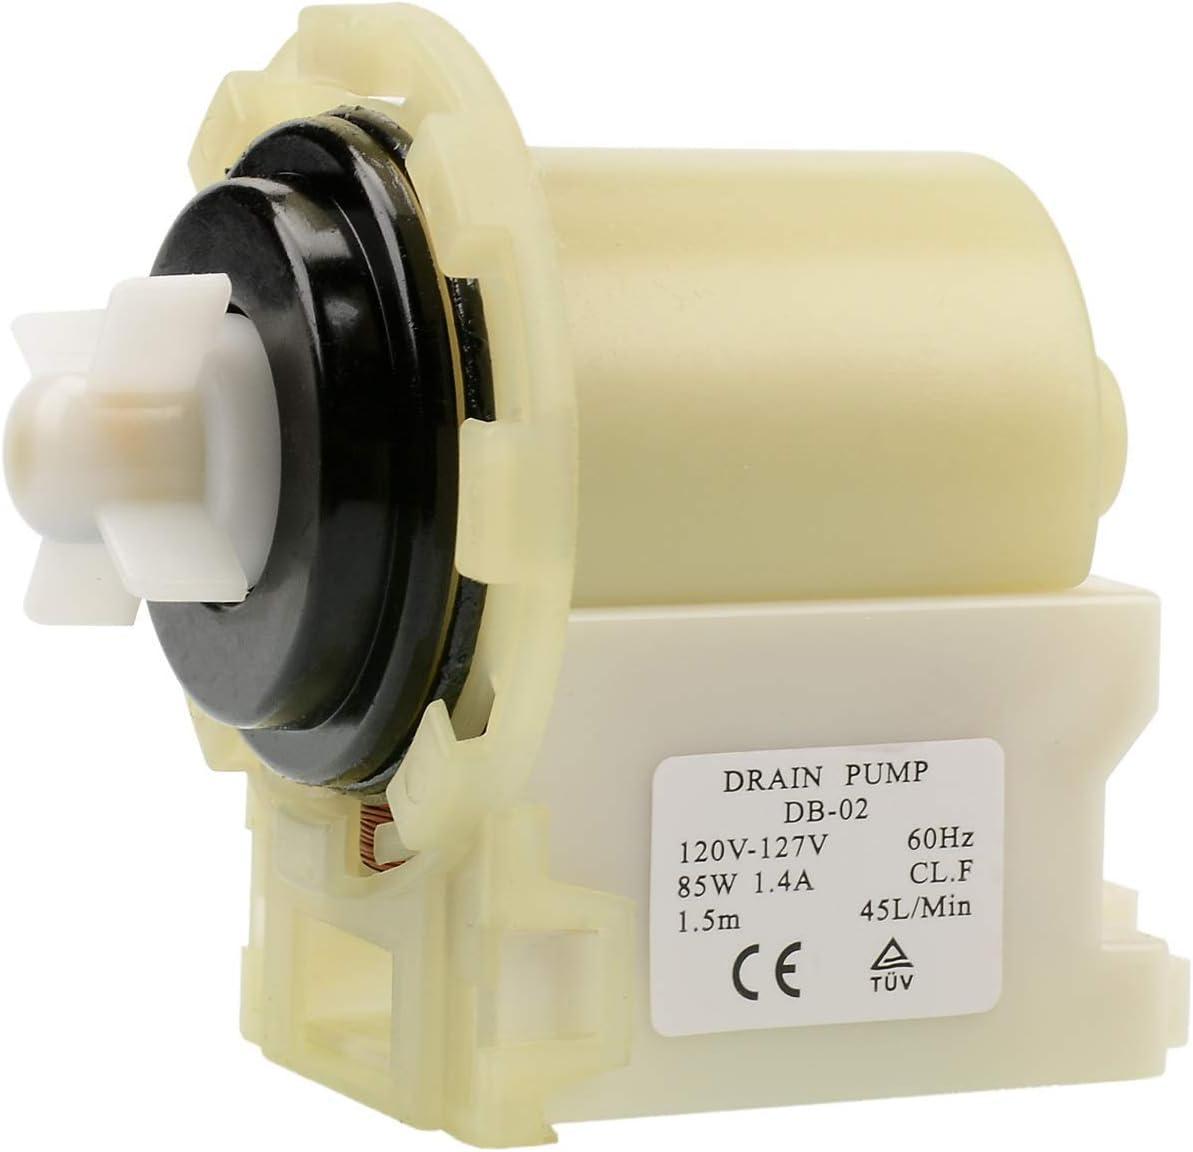 Drain Pump Motor Compatible Maytag Epic Z MHWZ400TQ02 Whirlpool Duet WFW8300SW02